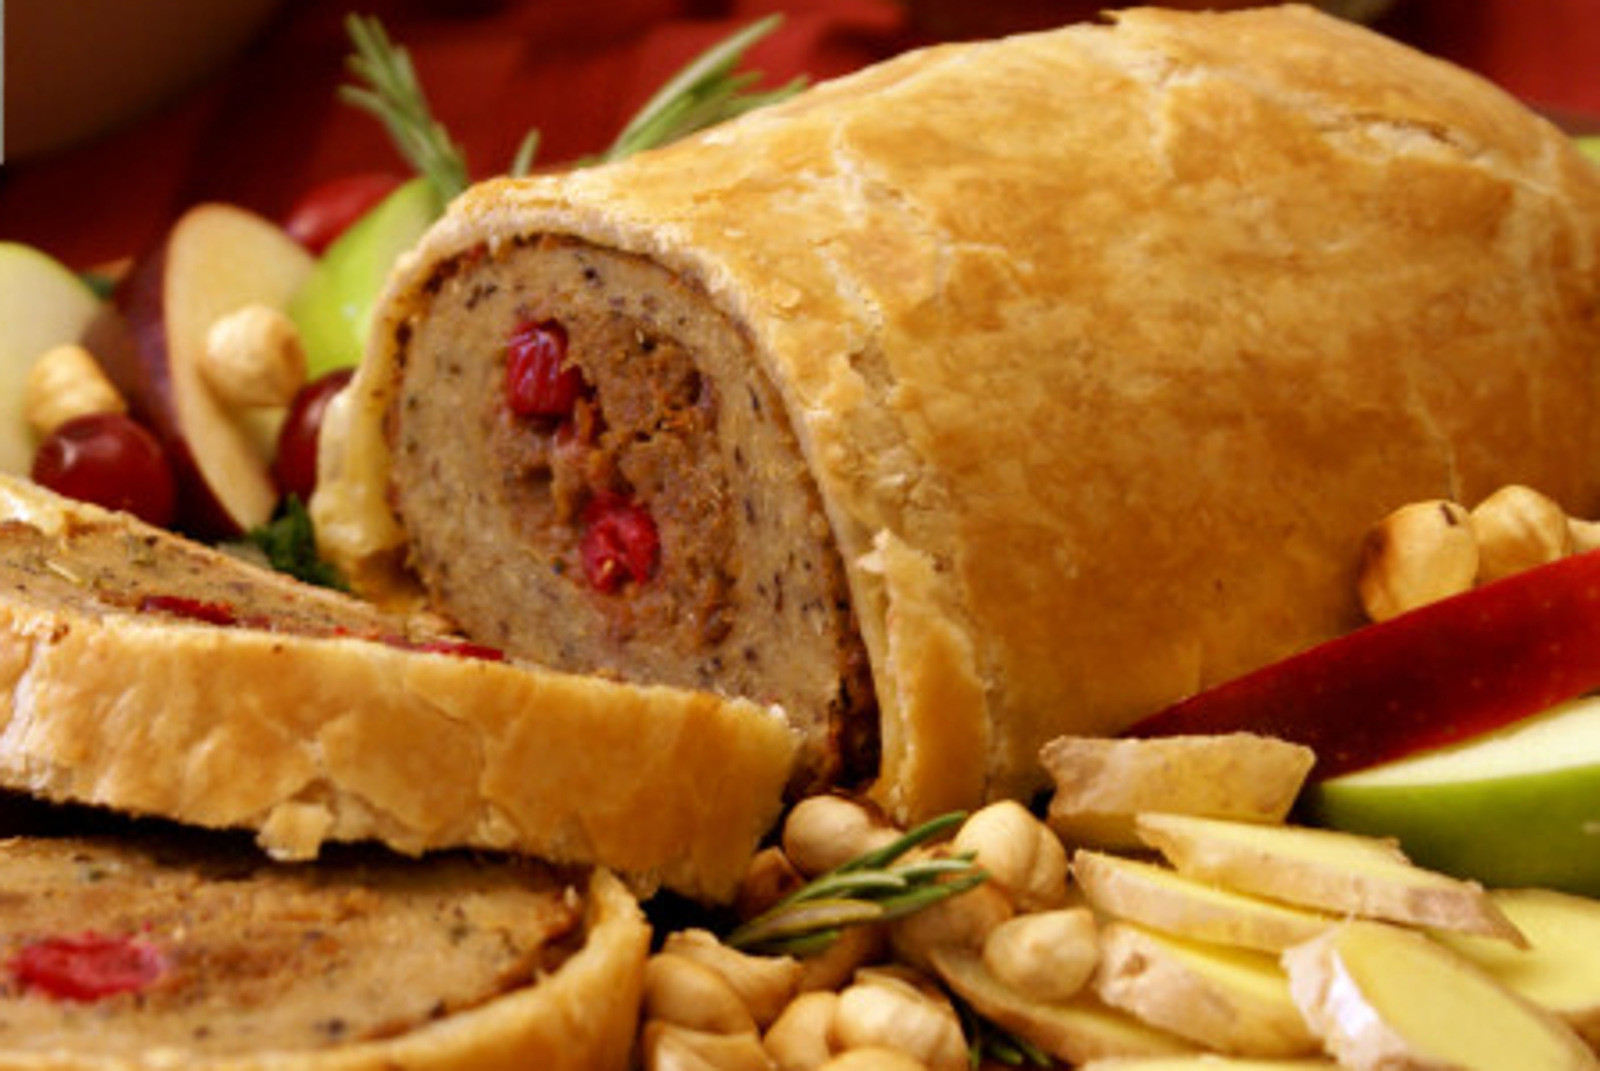 Turkey Alternatives For Thanksgiving  The Best Meatless Turkey Alternatives for Thanksgiving